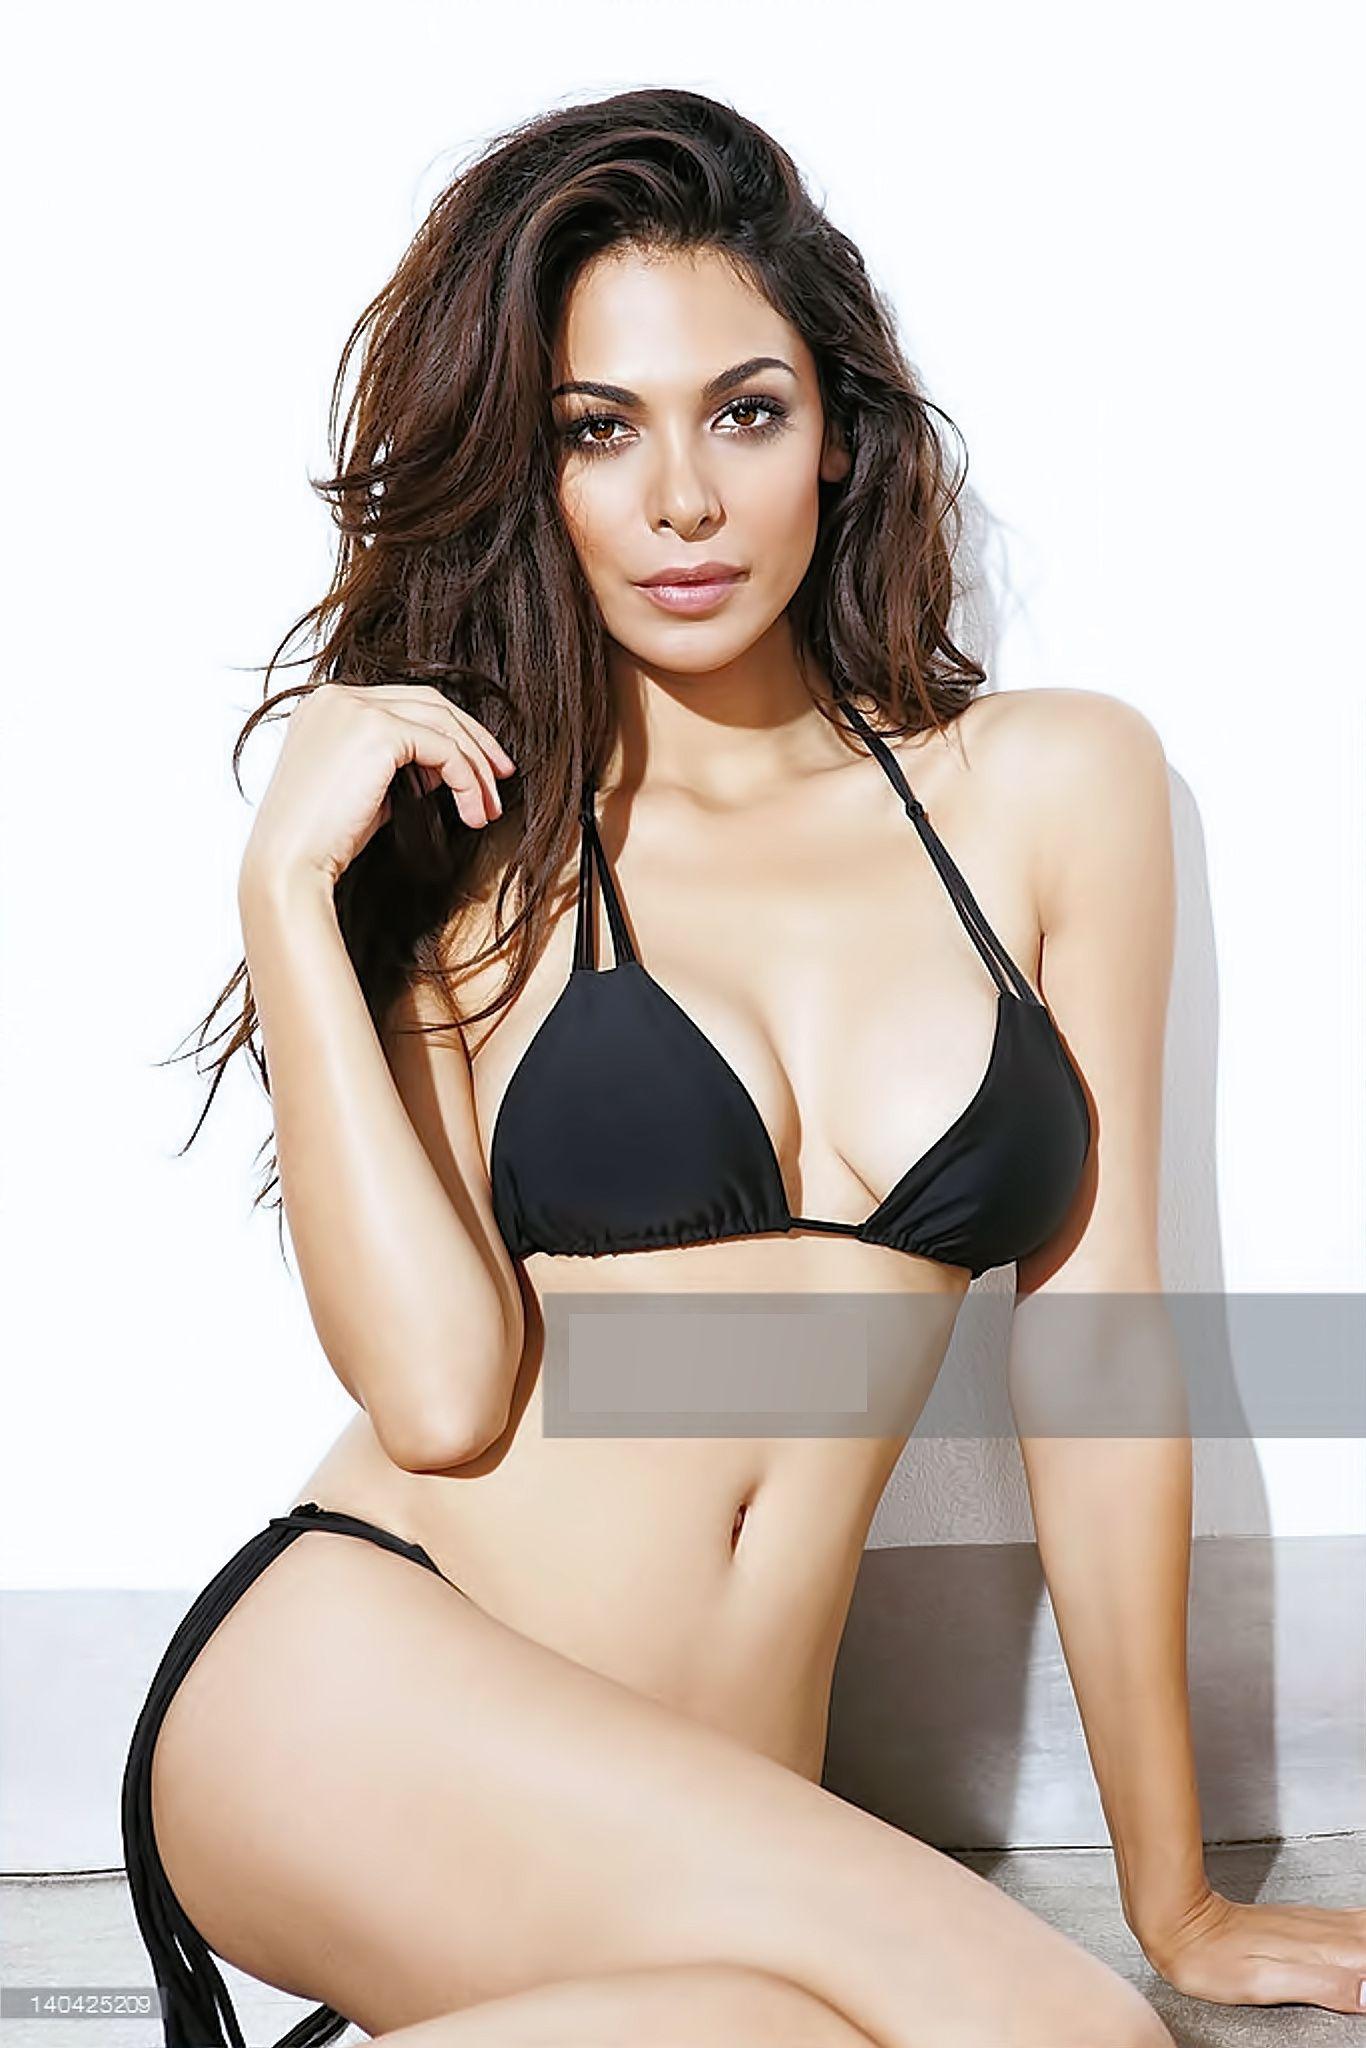 Bikini Shani Atias nudes (92 pics), Twitter